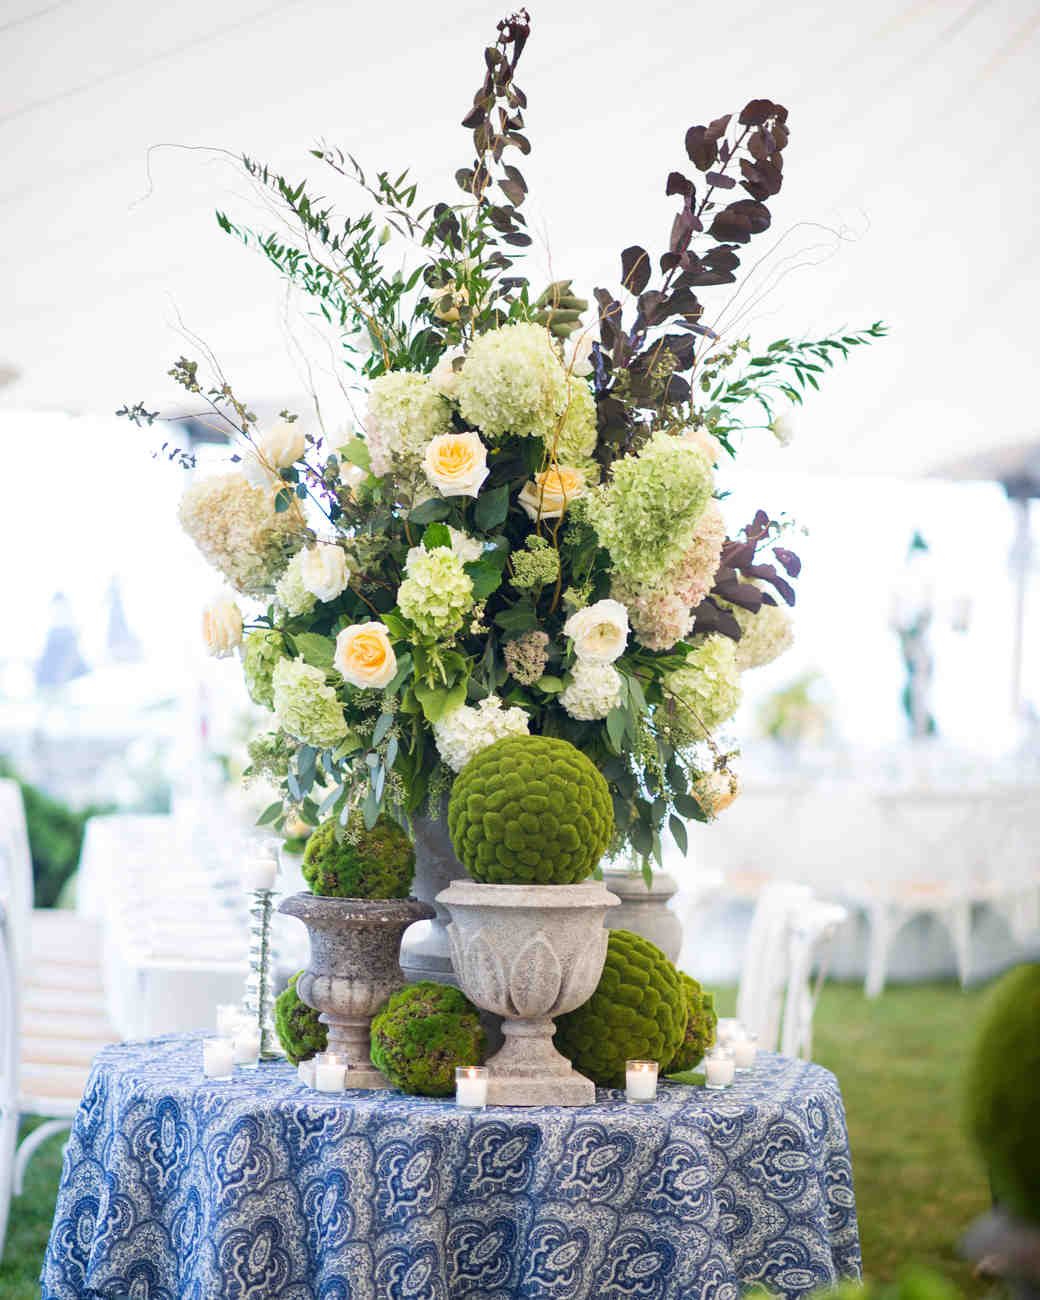 Flower Table Arrangements For Weddings: Green Wedding Centerpieces